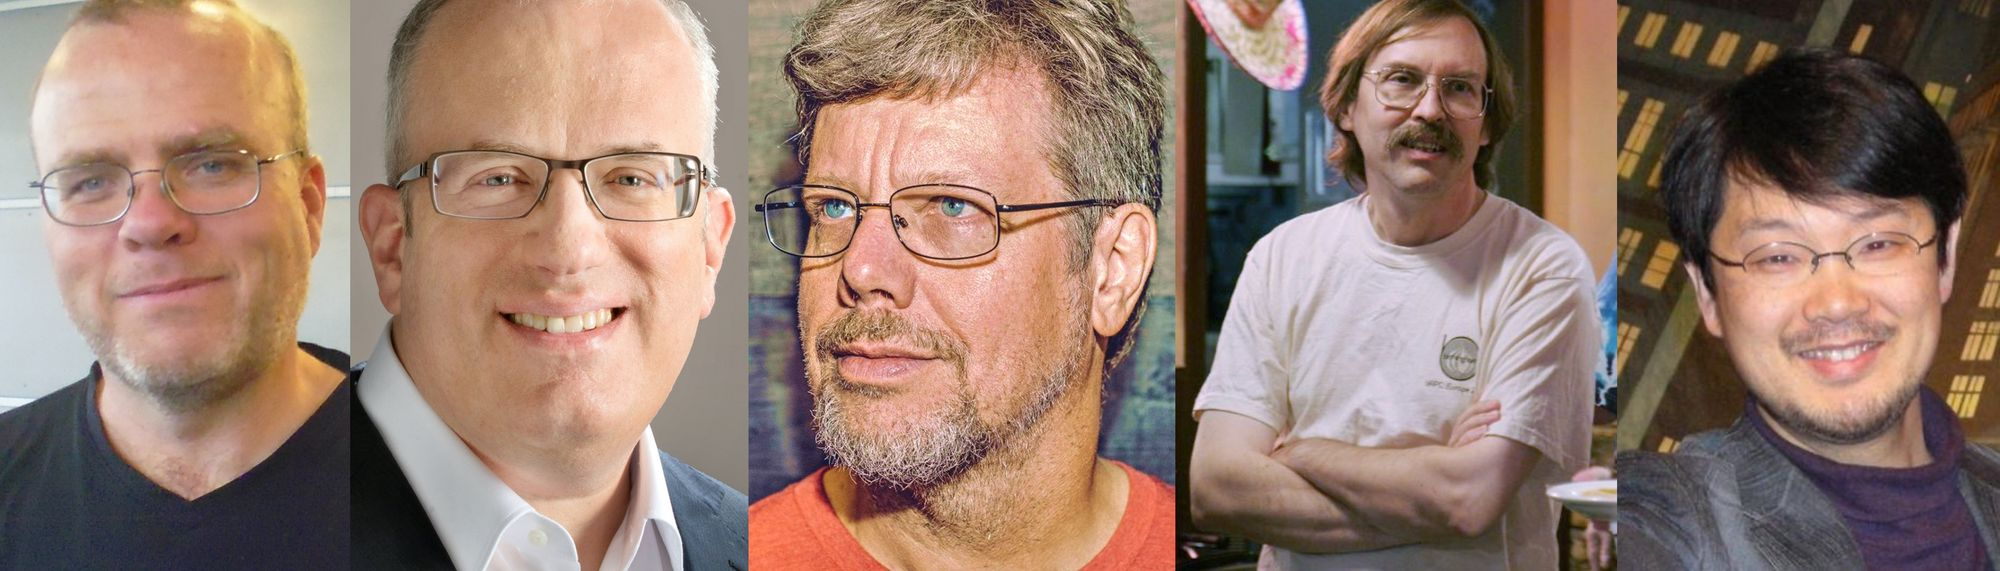 Collage of multiple photos. From the left: Rasmus Lerdorf (creator of PHP), Brendan Eich (creator of JavaScript), Guido van Rossum (creator of Python), Larry Wall (creator of Perl) and Yukihiro Matsumoto (creator of Ruby)